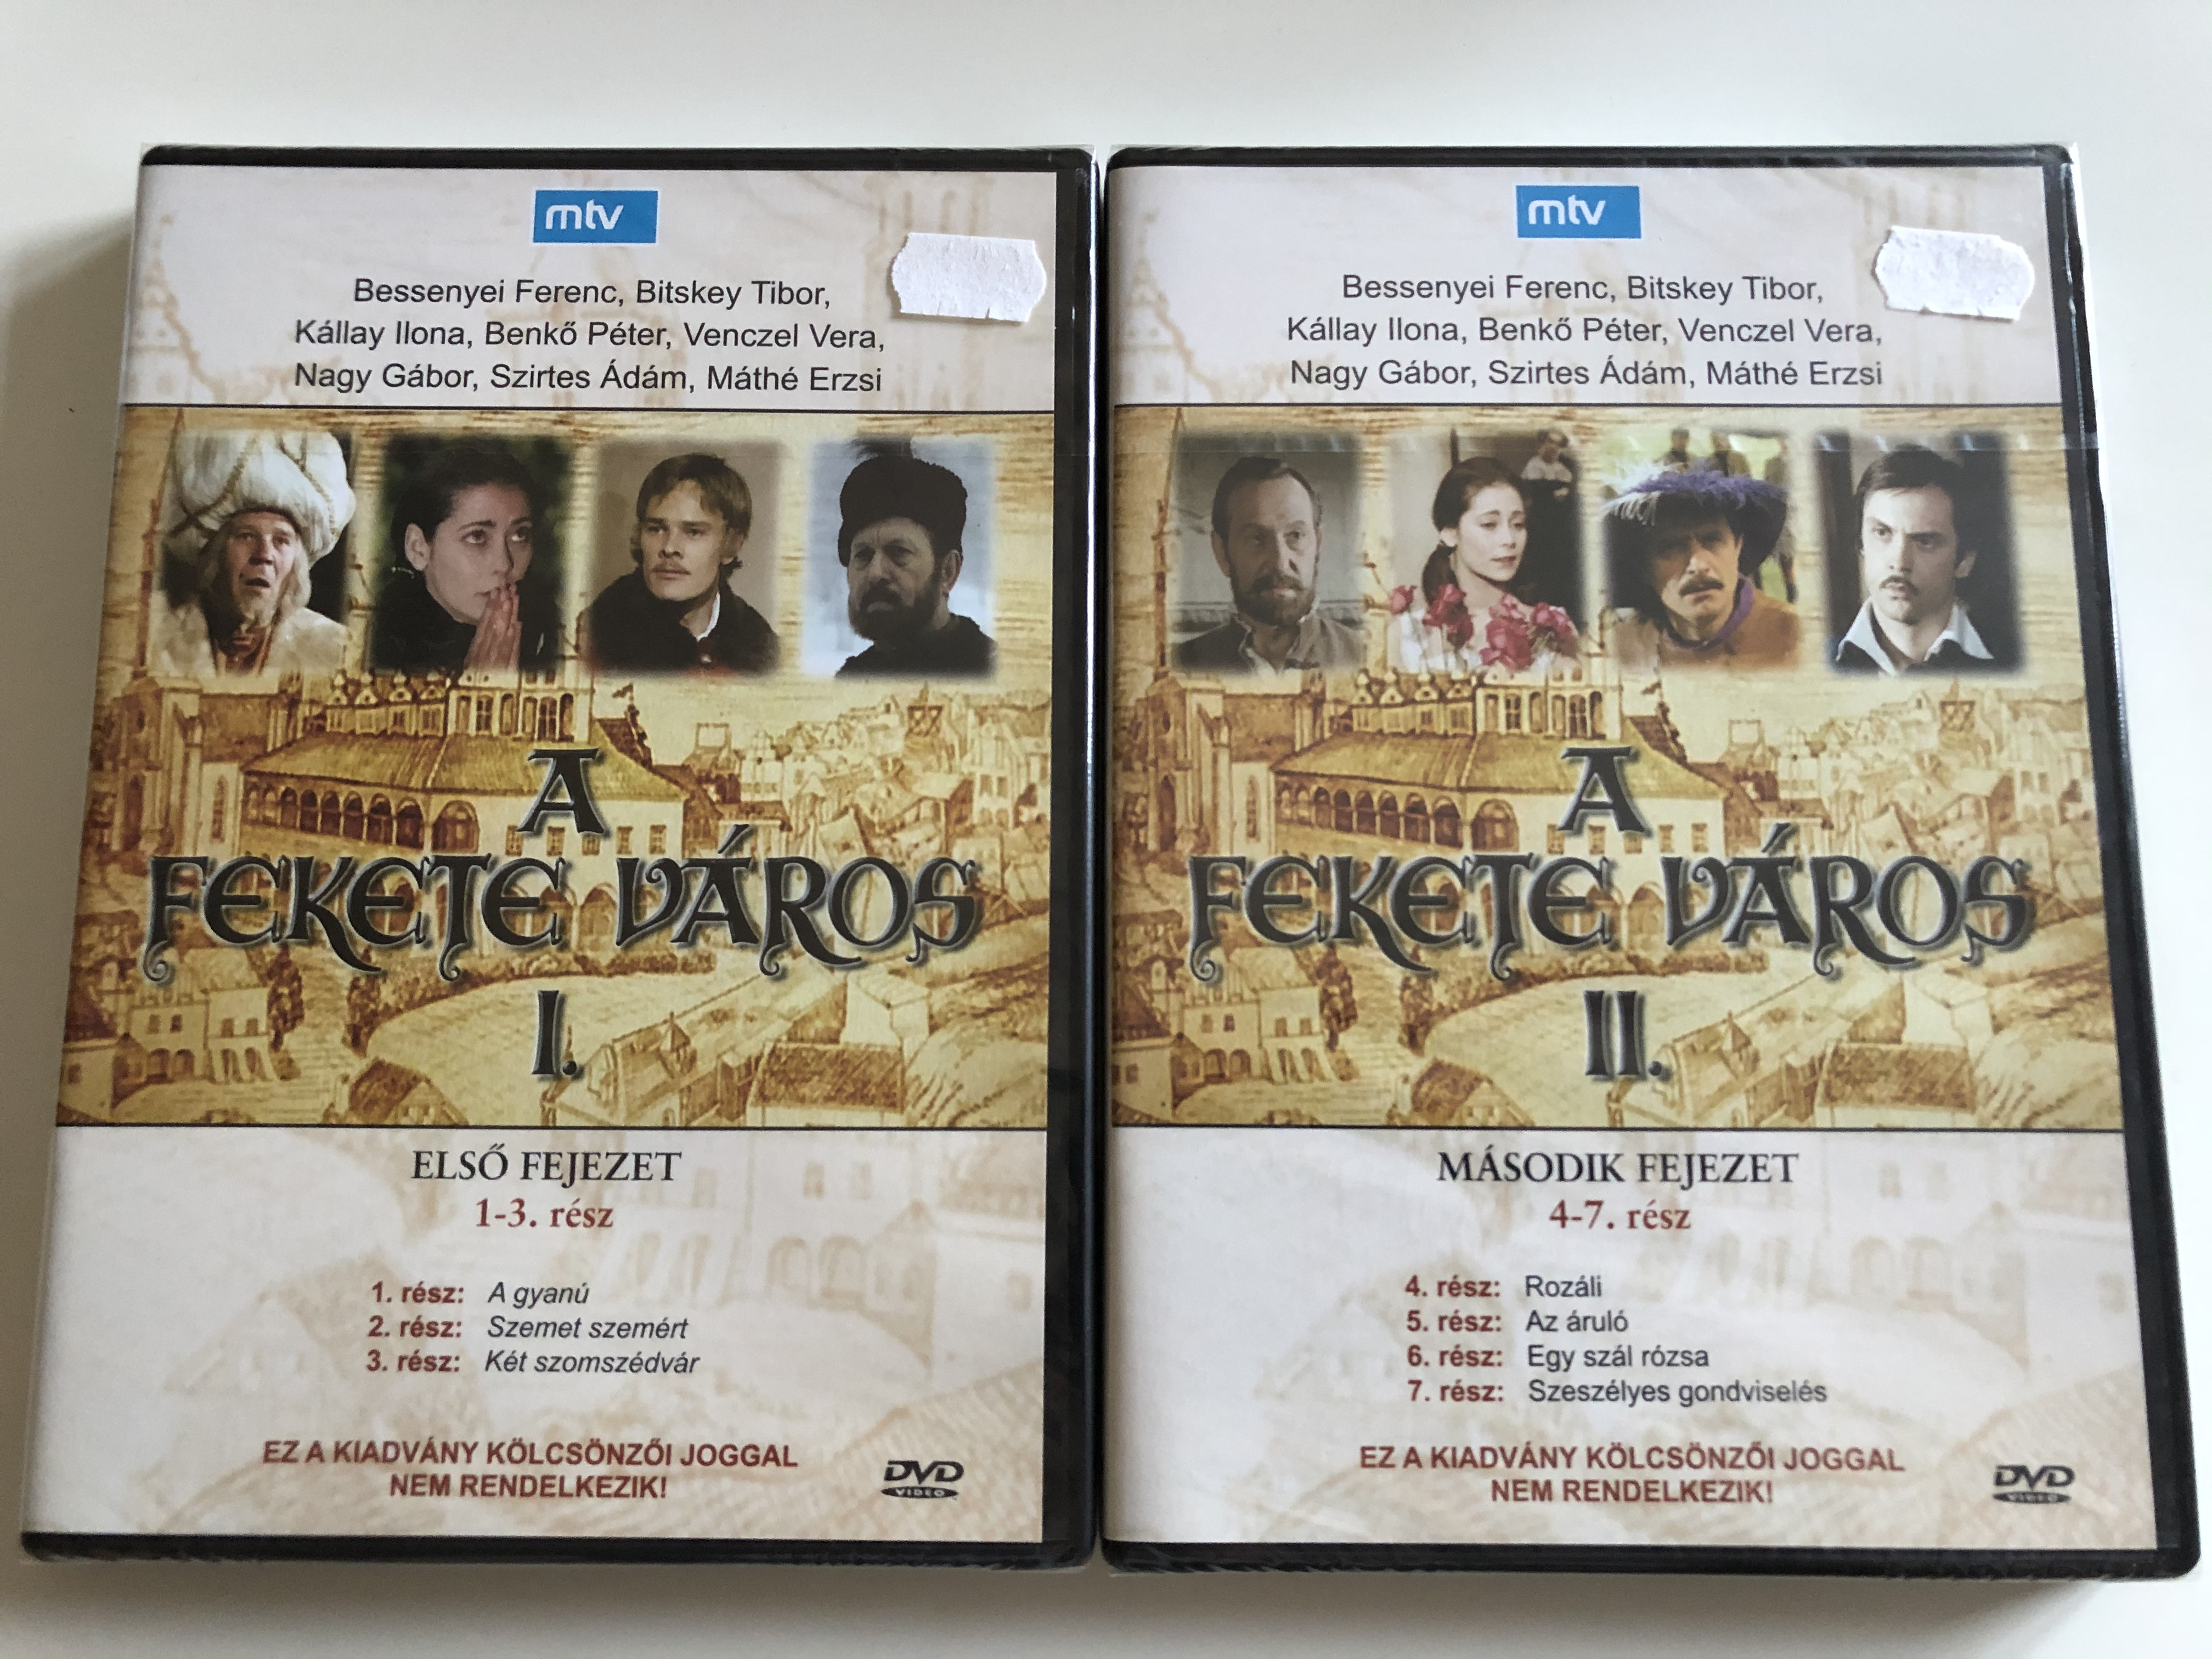 a-fekete-v-ros-i-ii.-dvd-set-1971-1-7.r-sz-the-black-city-1-2.-episodes-1-7-1.jpg